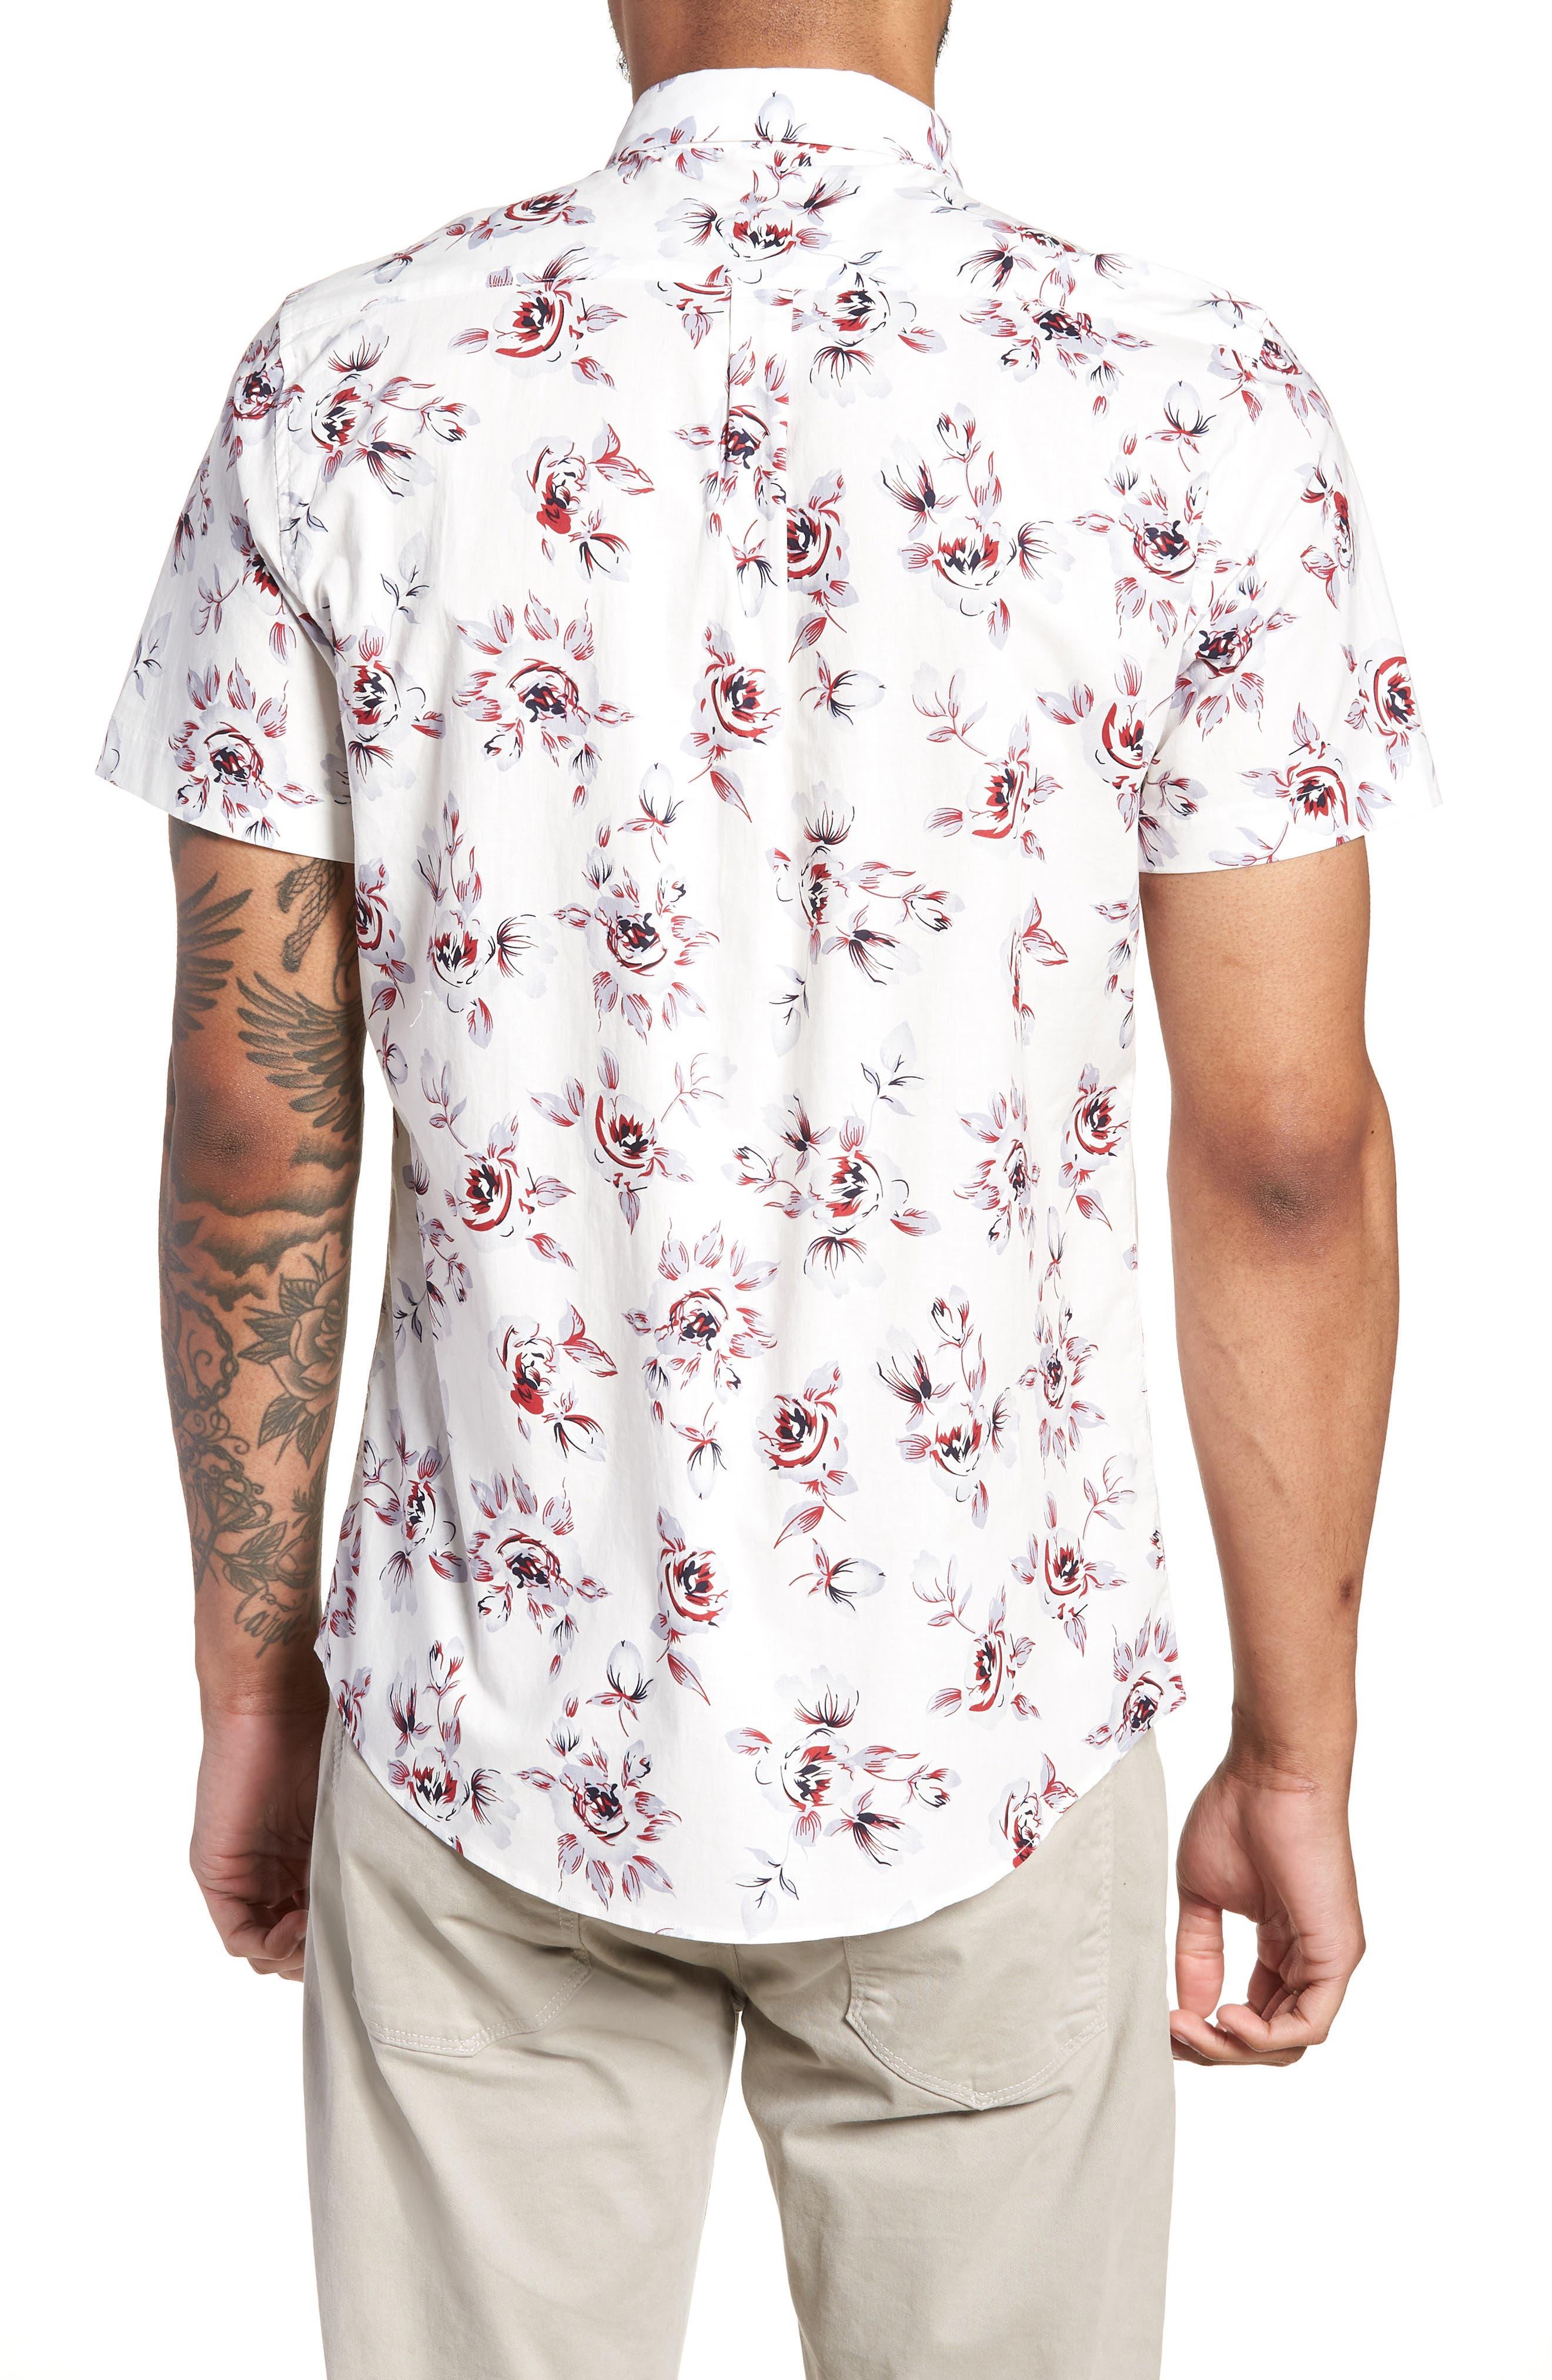 Trim Fit Print Woven Short Sleeve Shirt,                             Alternate thumbnail 2, color,                             White Red Rose